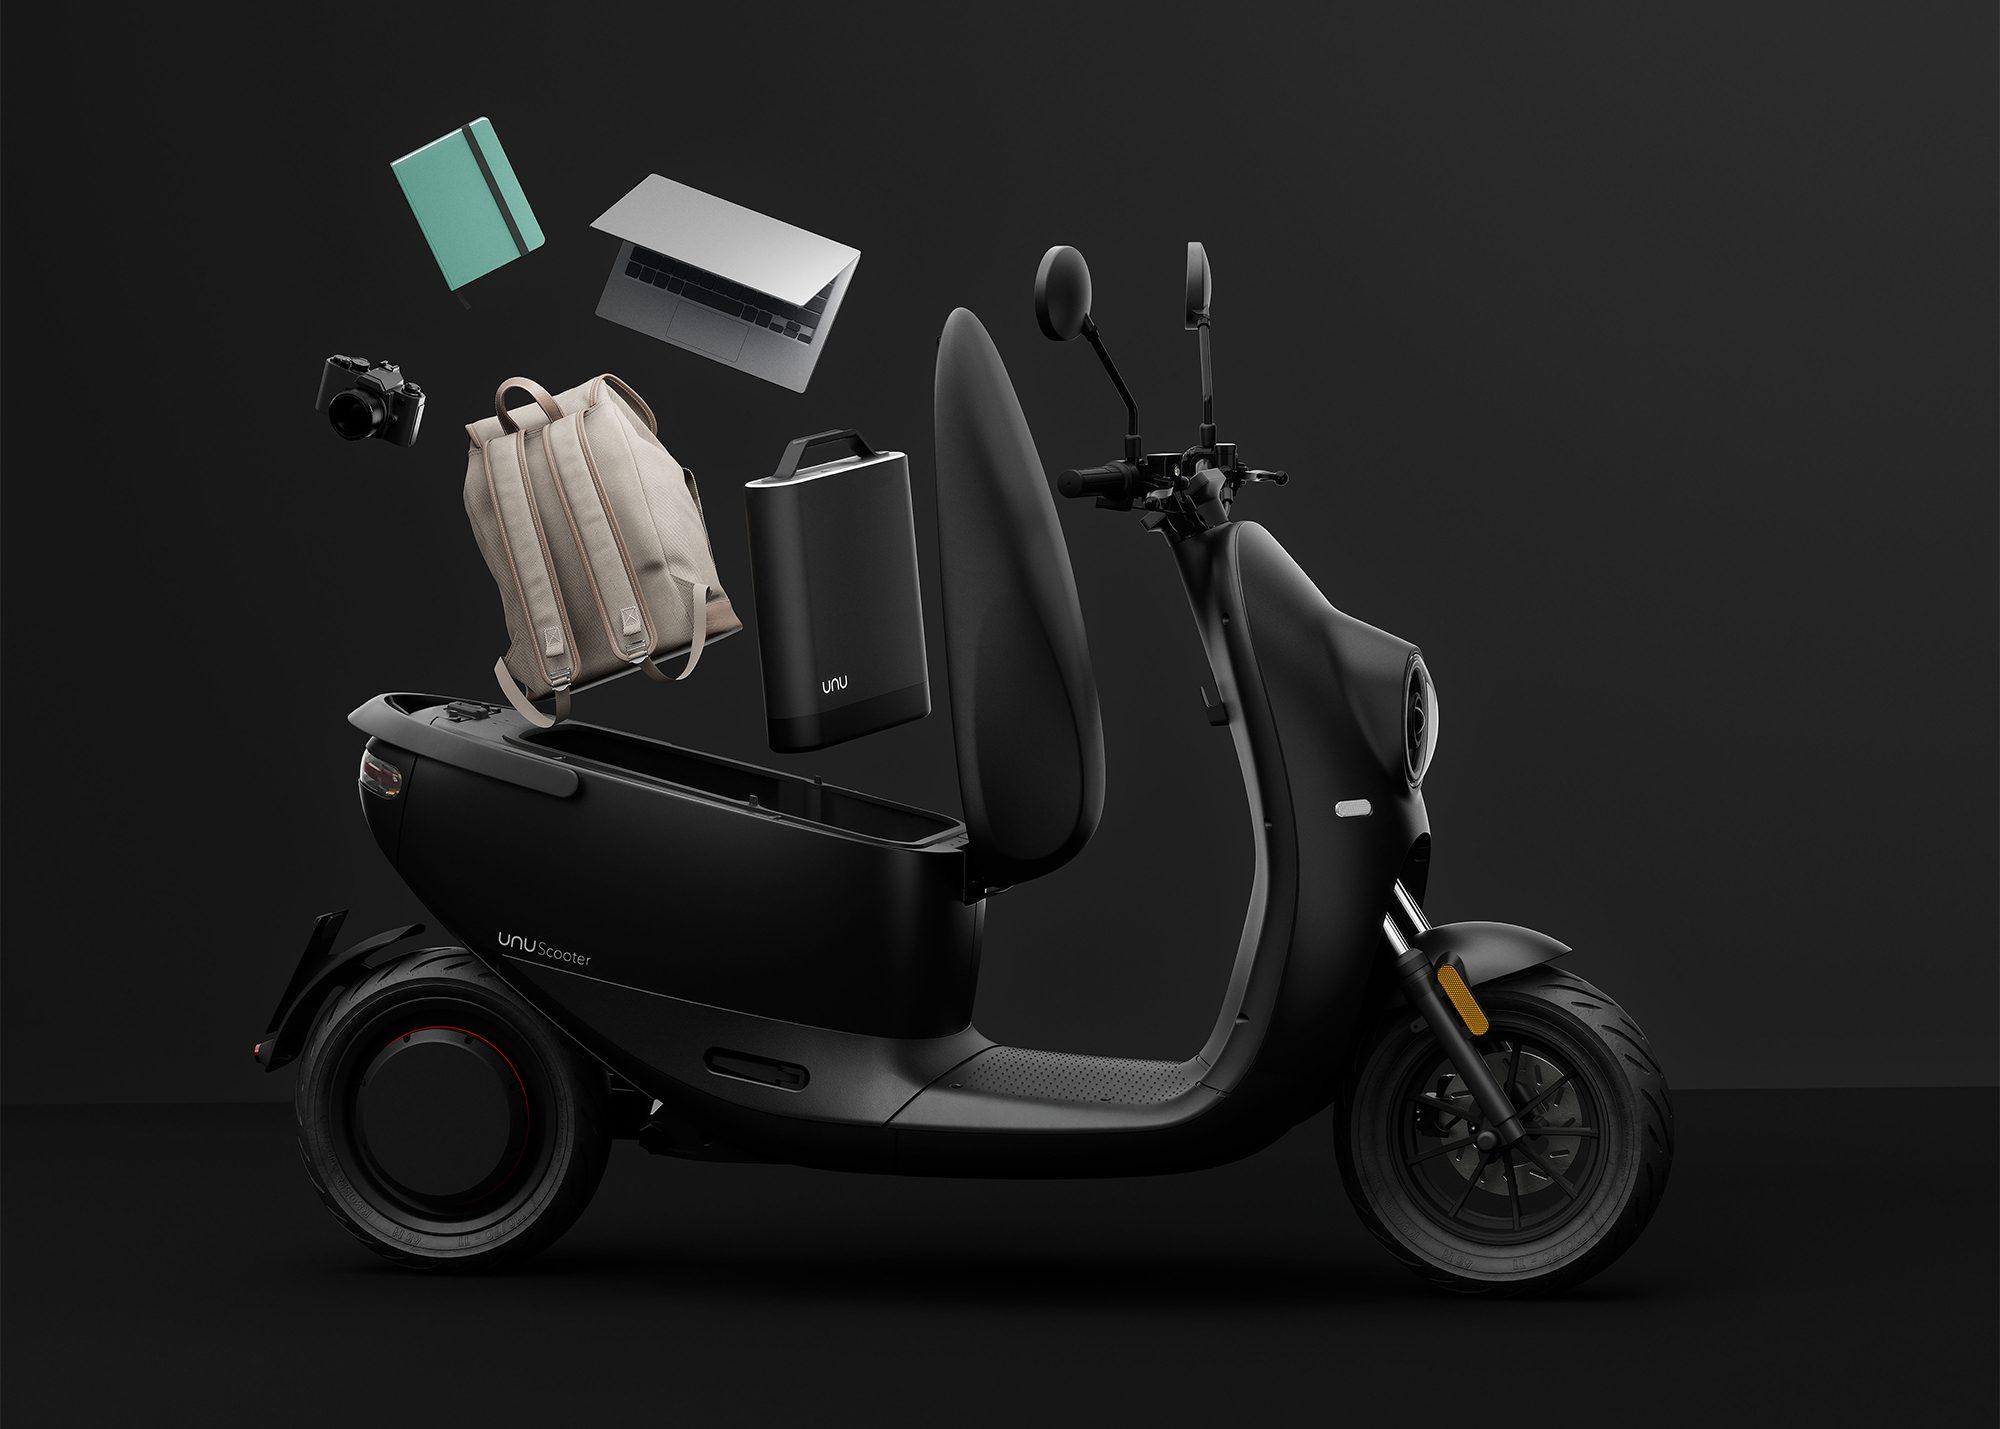 Christian Zanzanotti ontwerpt nieuwe elektrische unu scooter